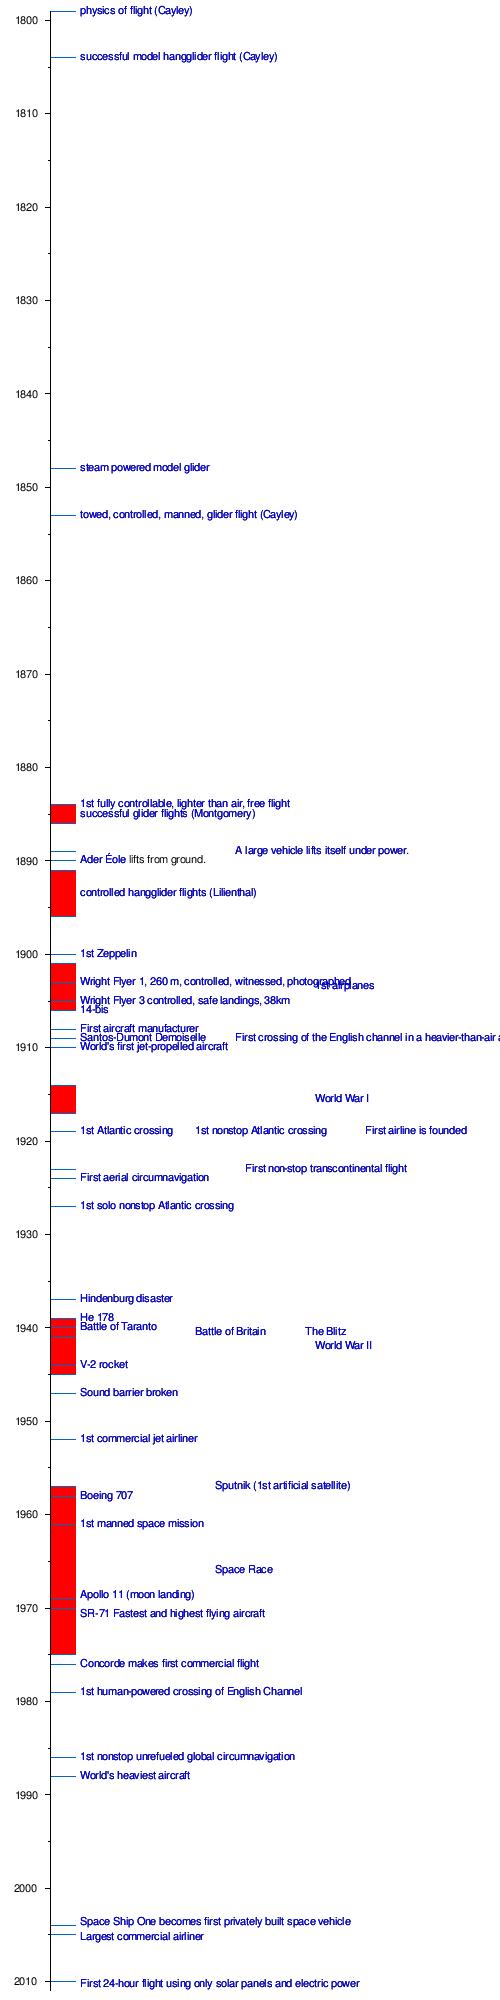 Timeline of aviation - Wikipedia